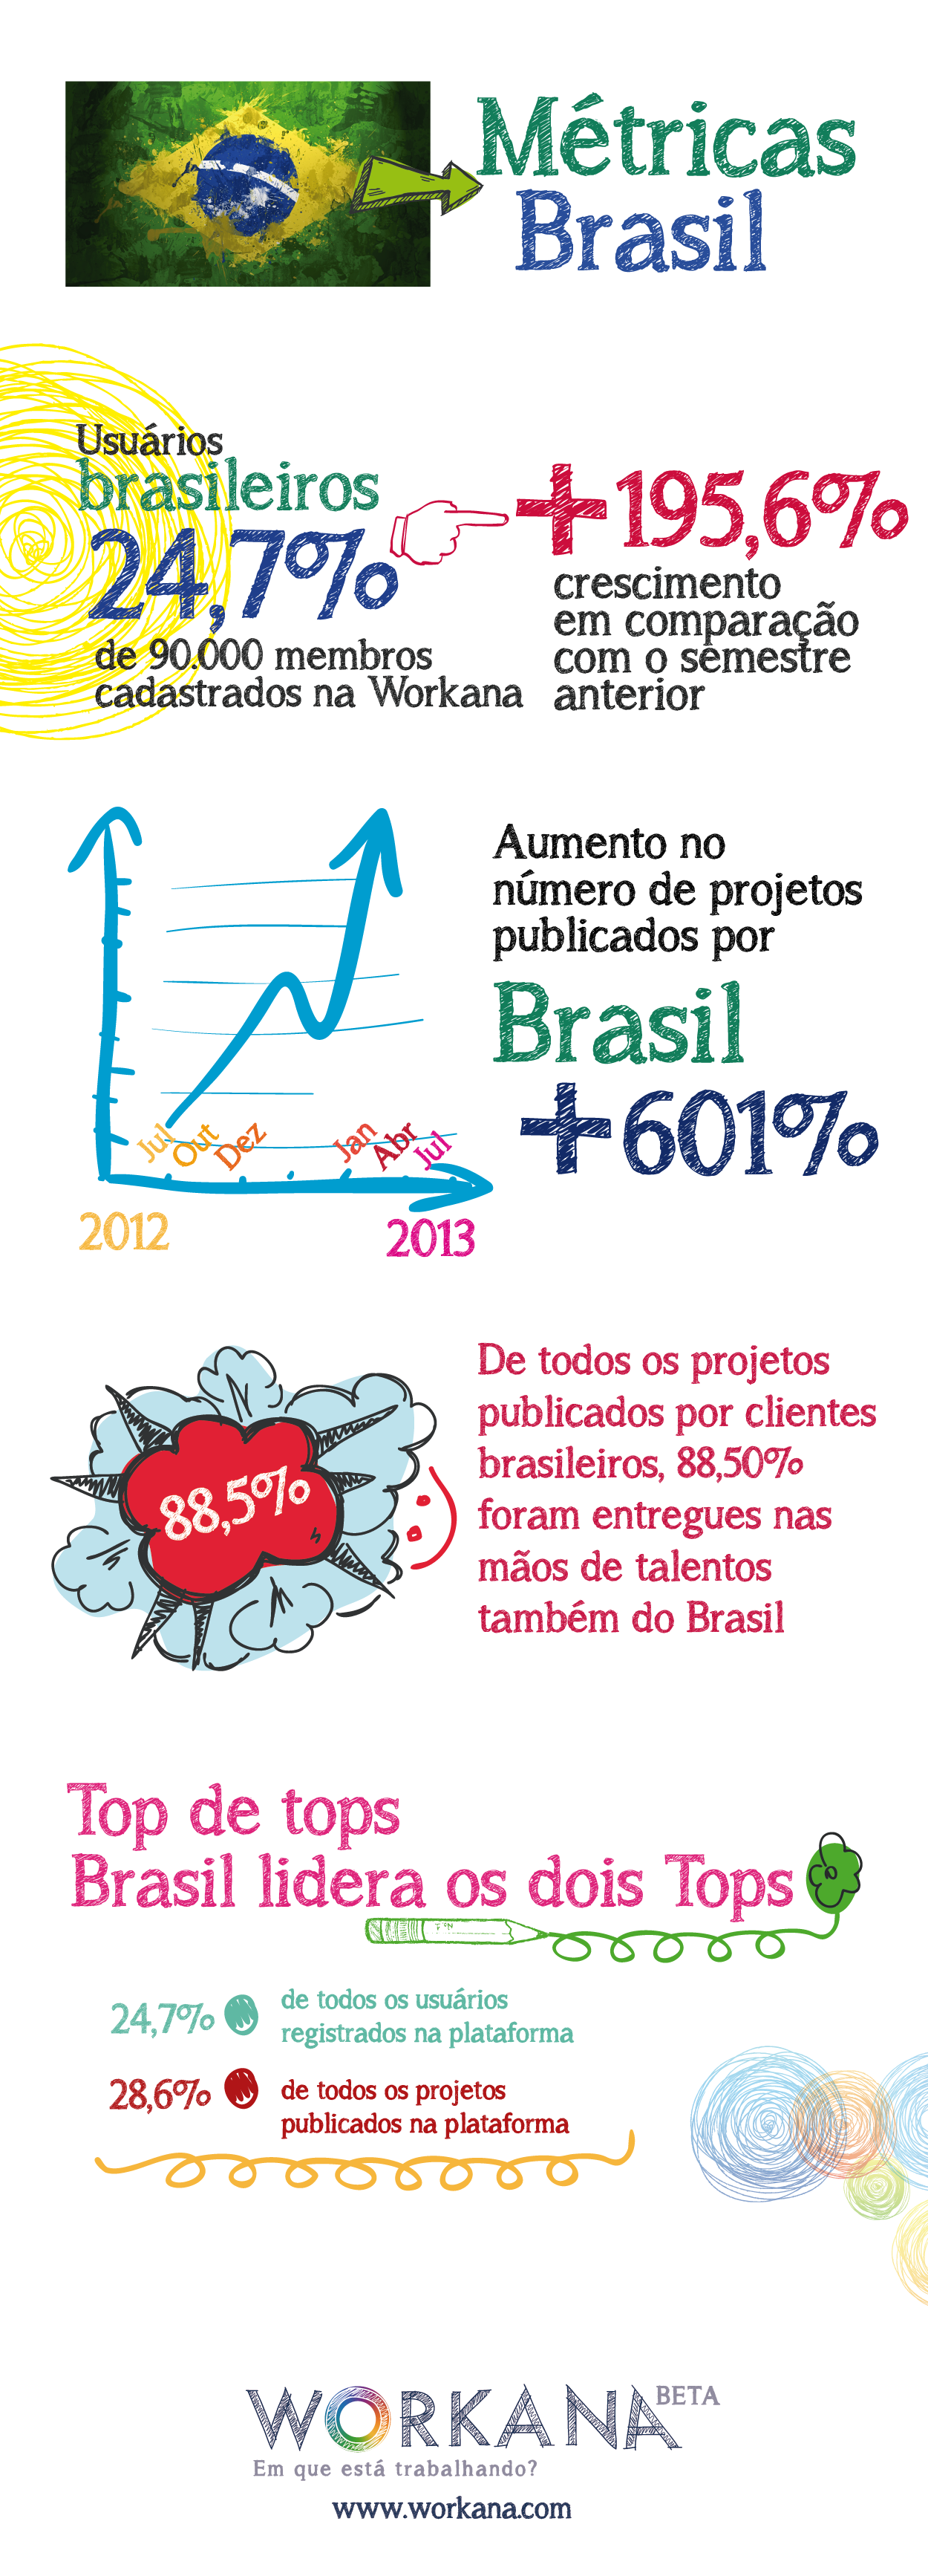 métricas Brasil na workana